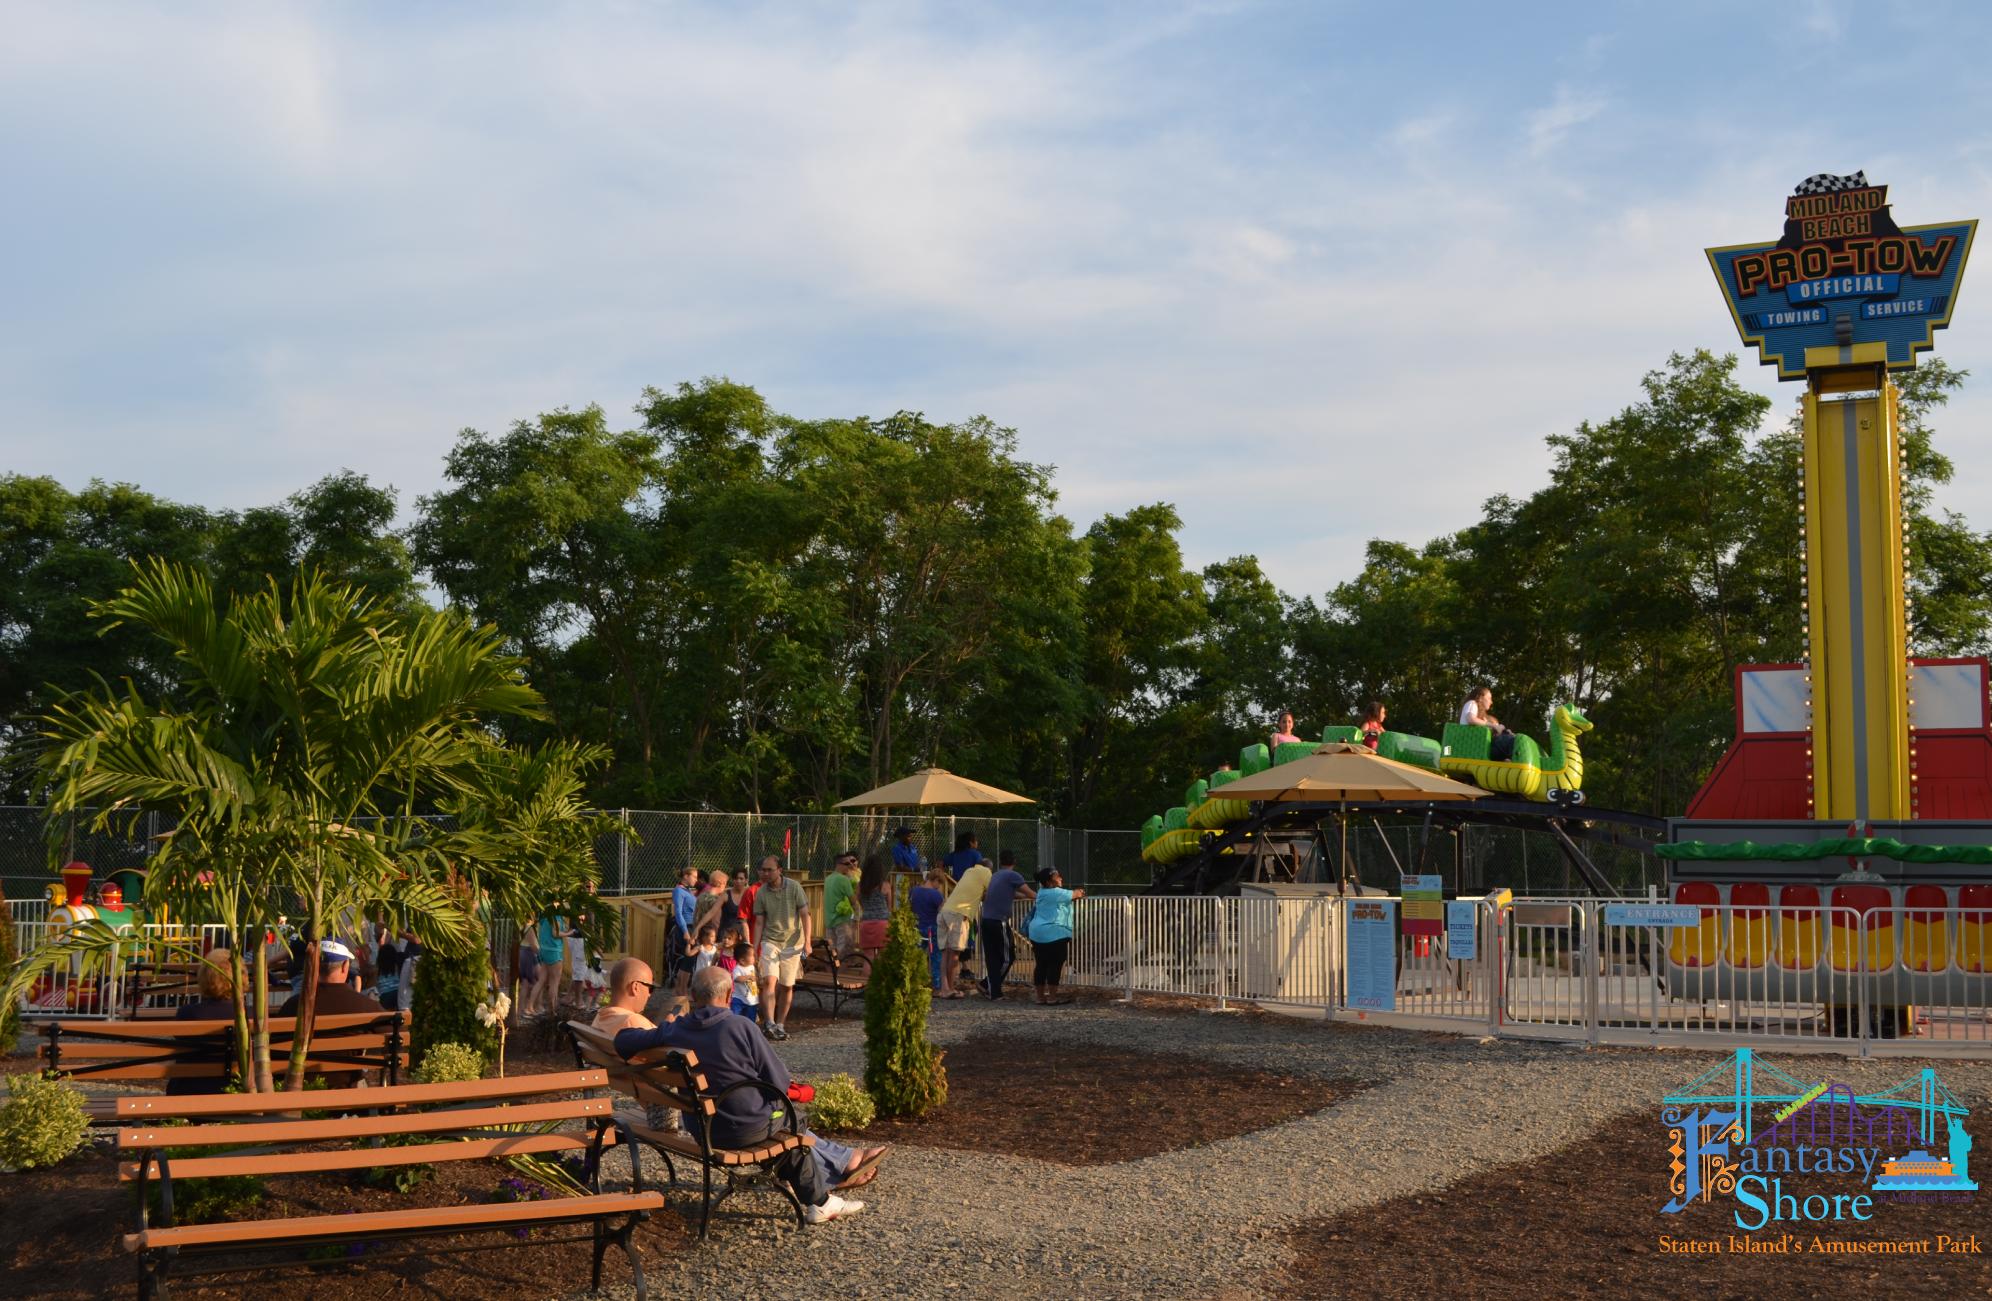 Staten Island Ride Entertainments